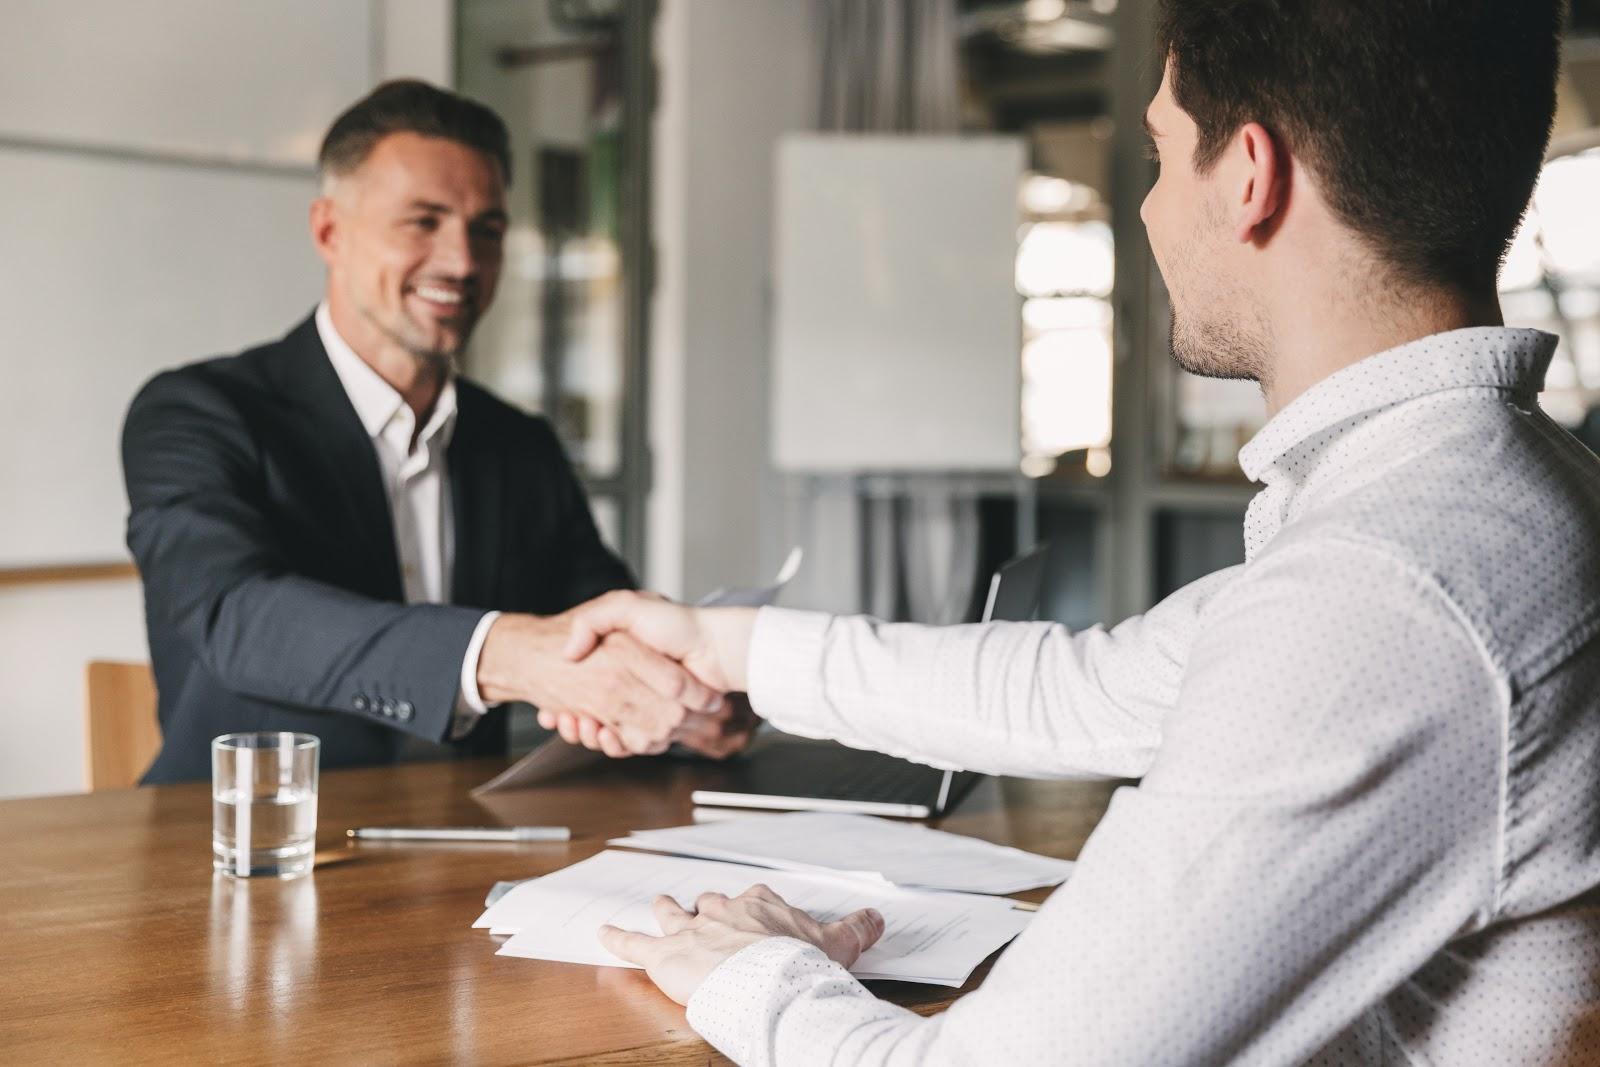 Employee retention strategies: Man shakes interviewee's hand